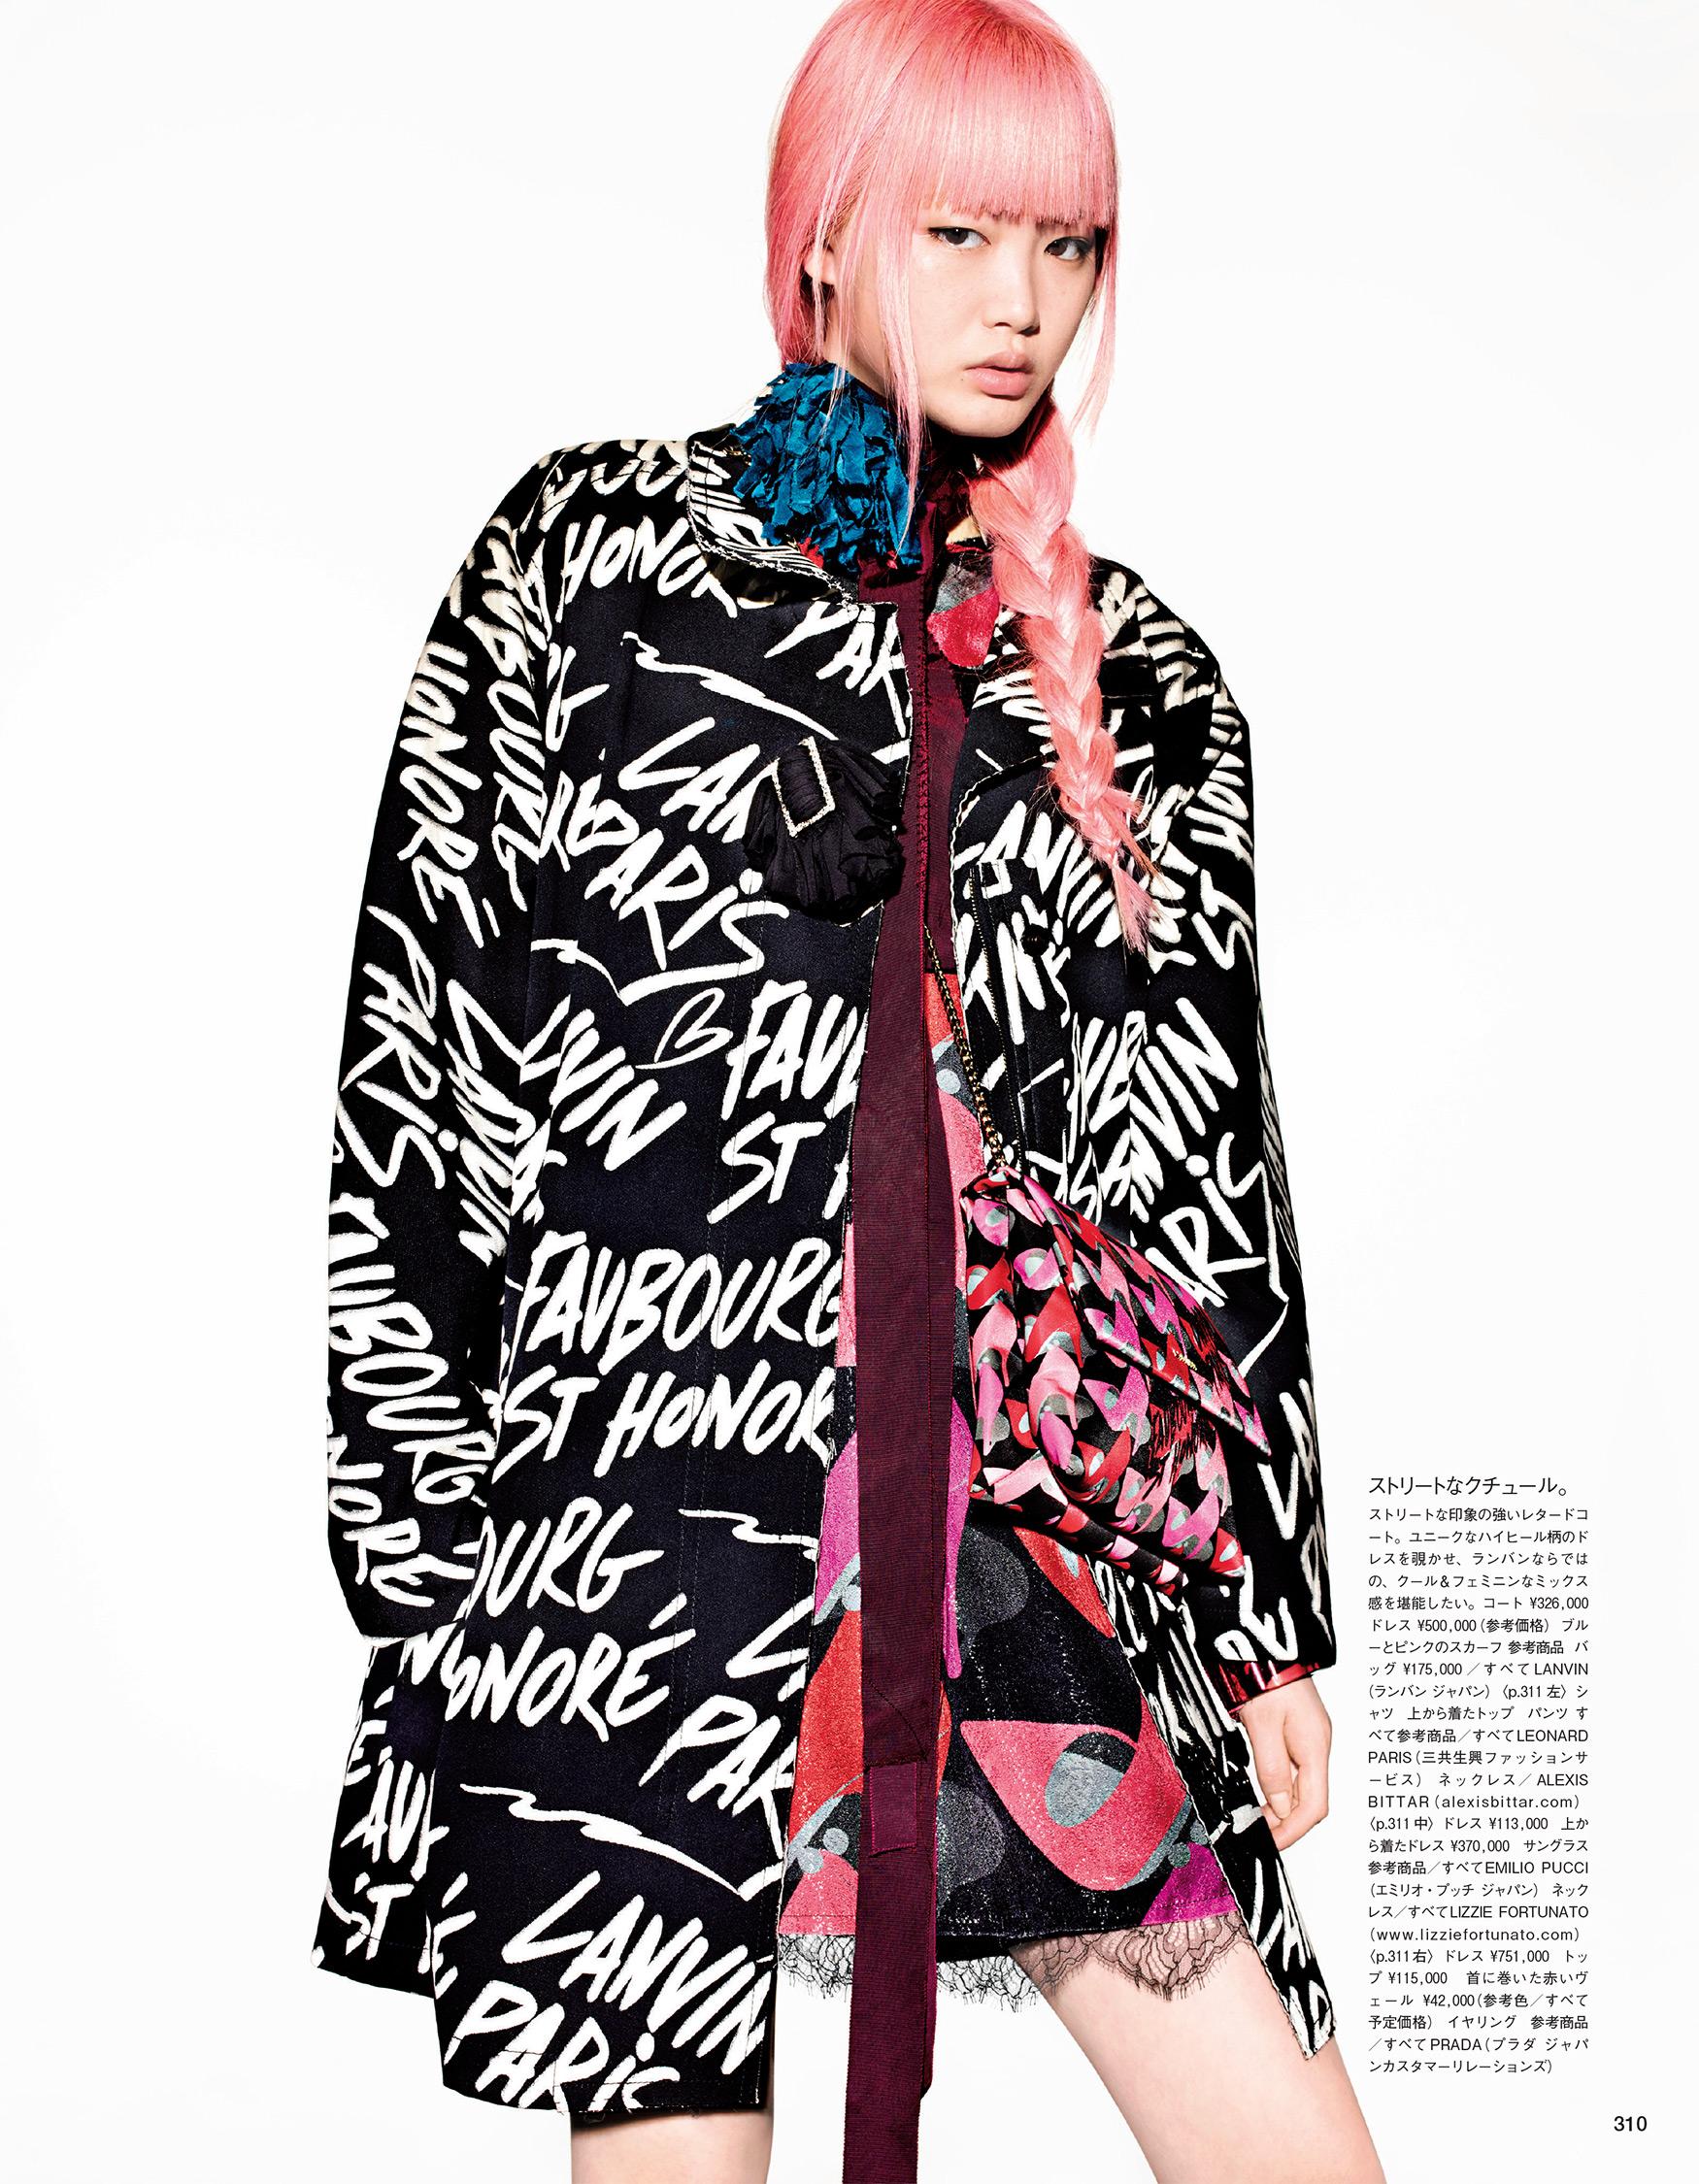 Giovanna-Battaglia-Vogue-Japan-The-Geek-Girls-Society-Richard-Brubridge-4.jpg